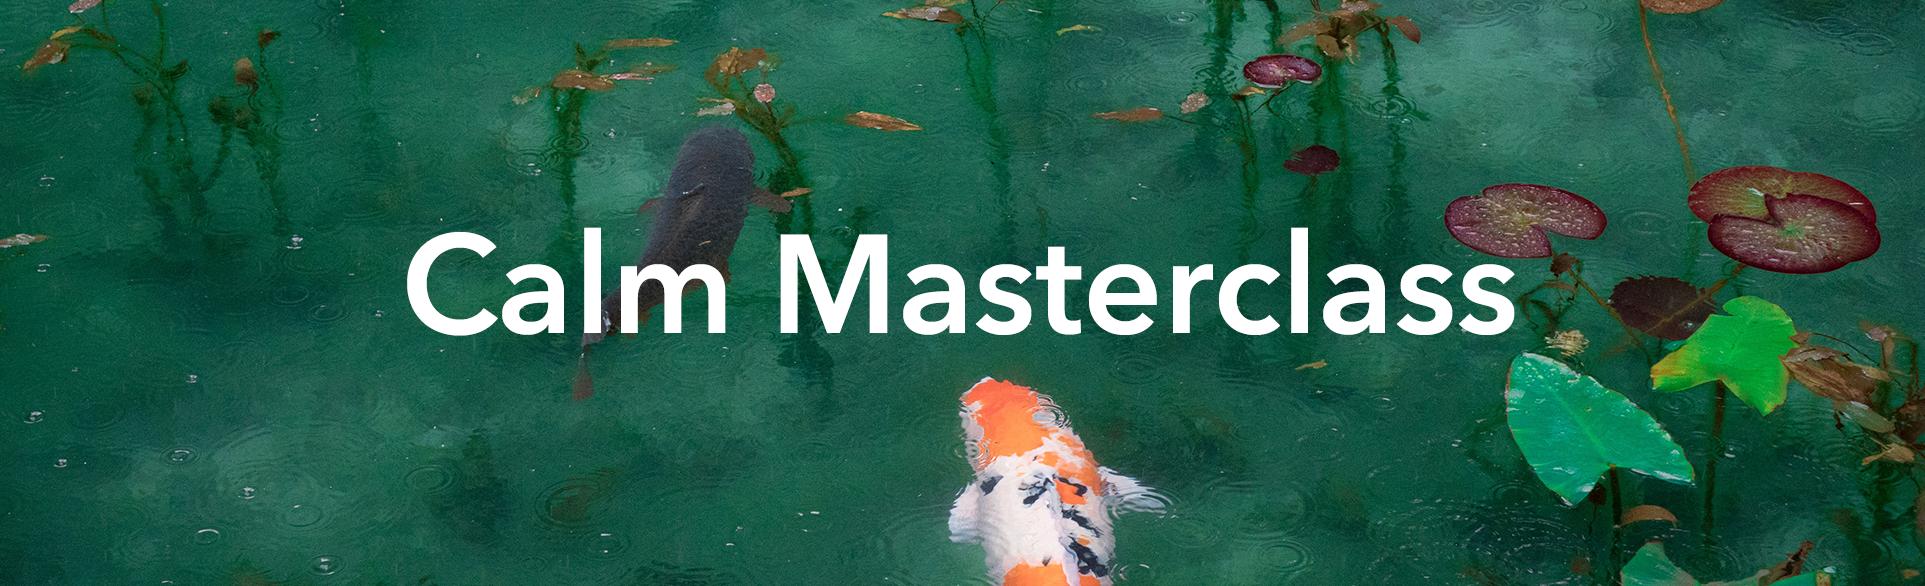 Calm Masterclass.png